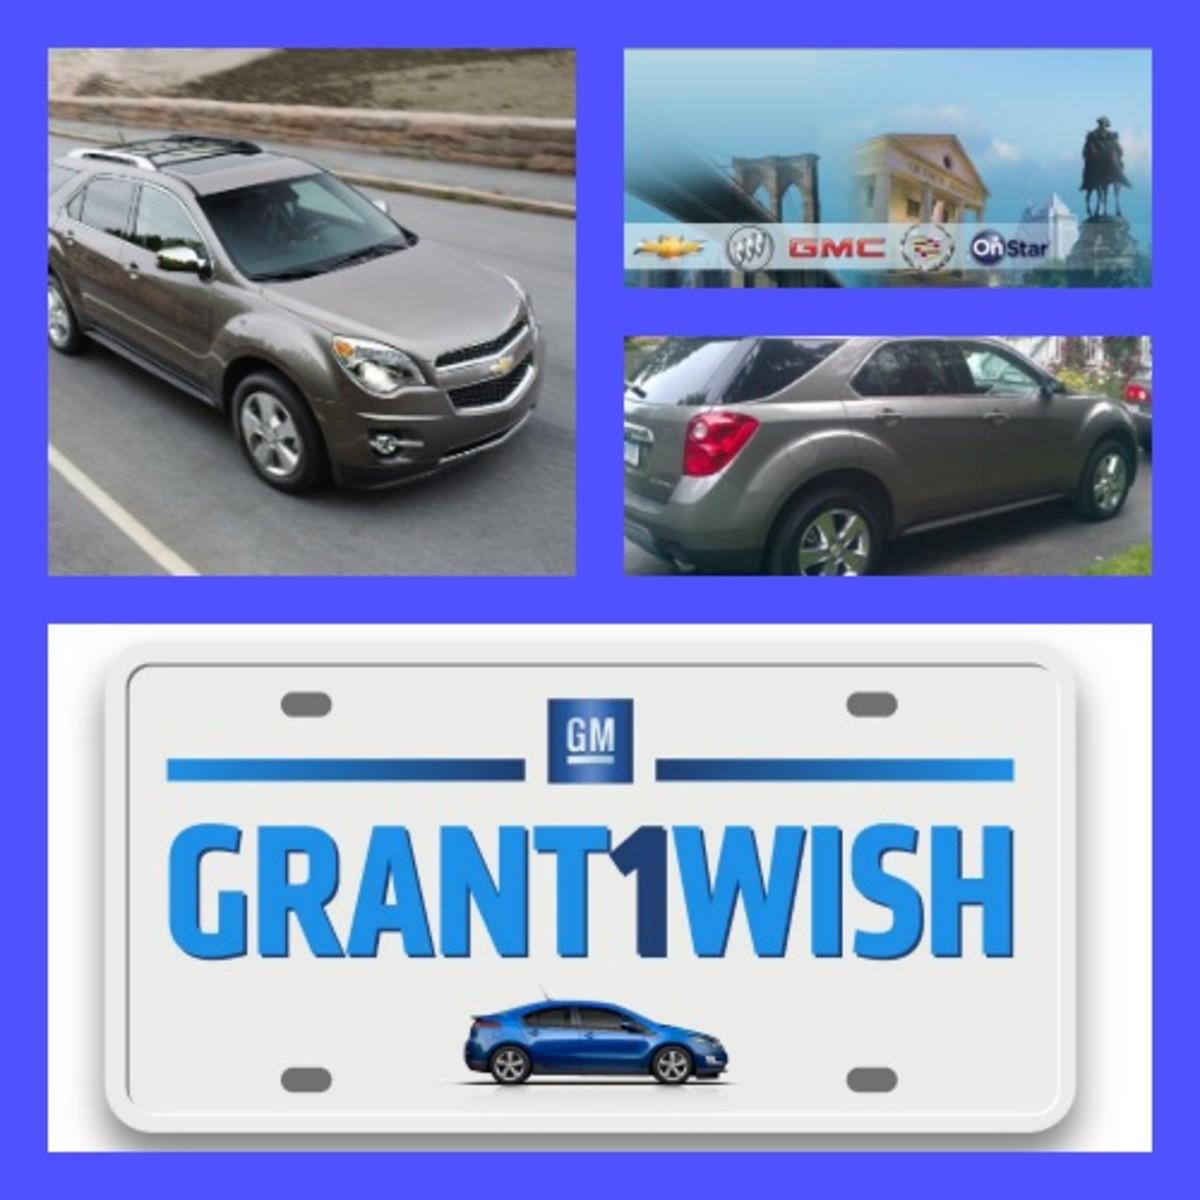 GrantOneWish